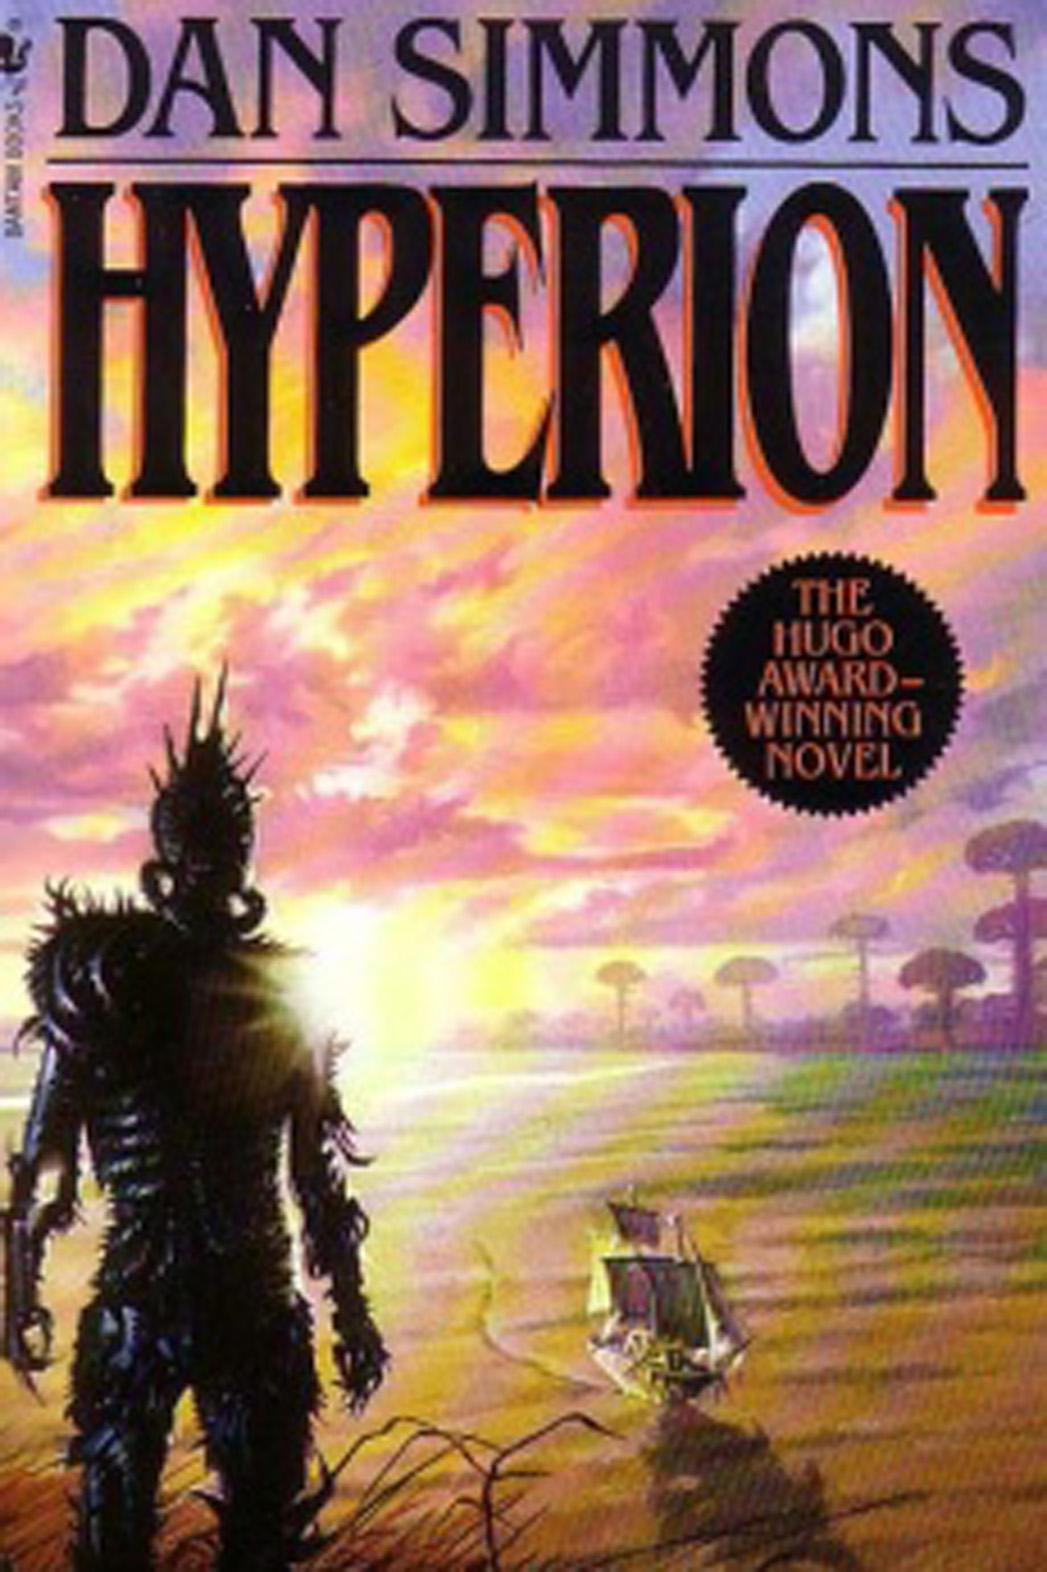 Dan Simmons Hyperion Cover - P 2015